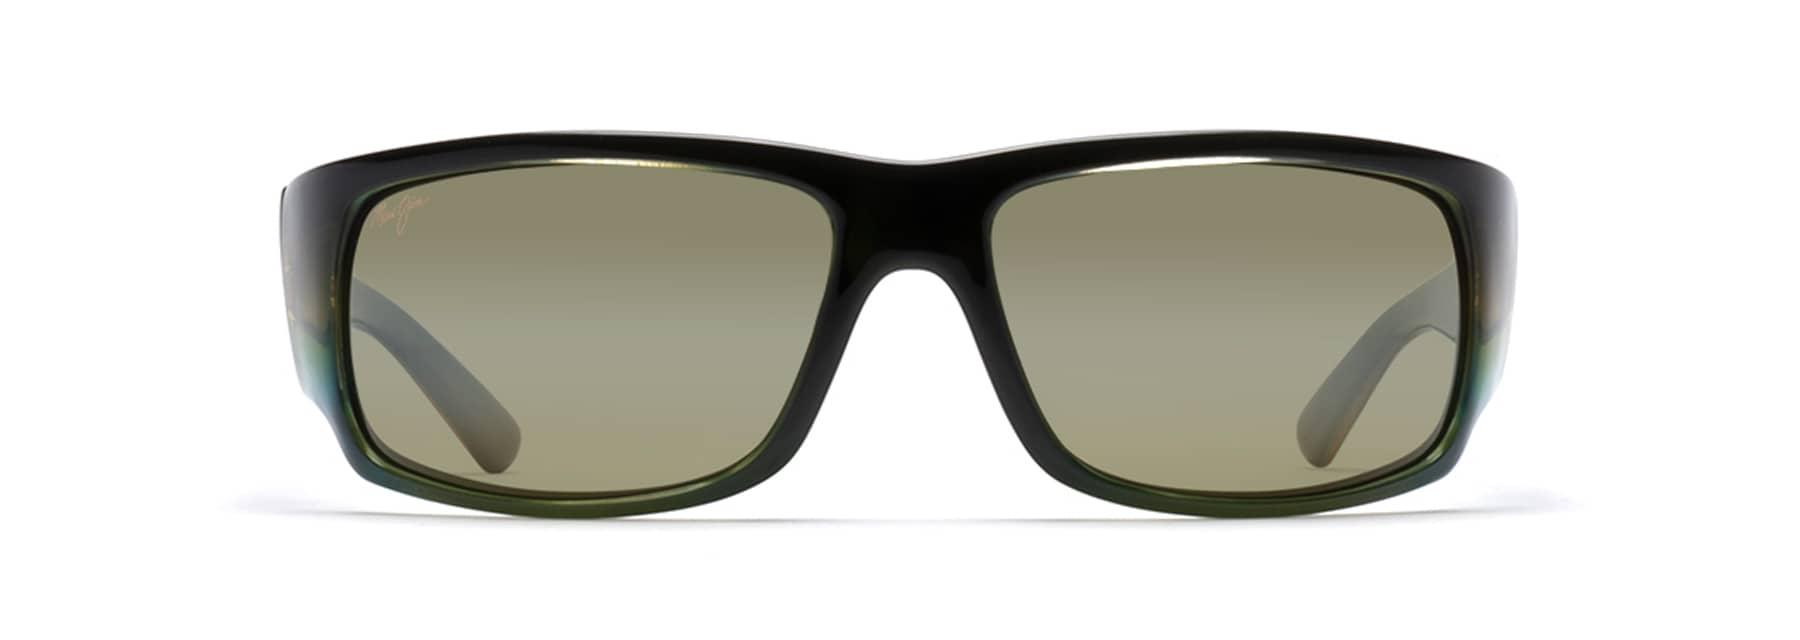 9dc4e9fe16bb World Cup Polarised Sunglasses   Maui Jim®